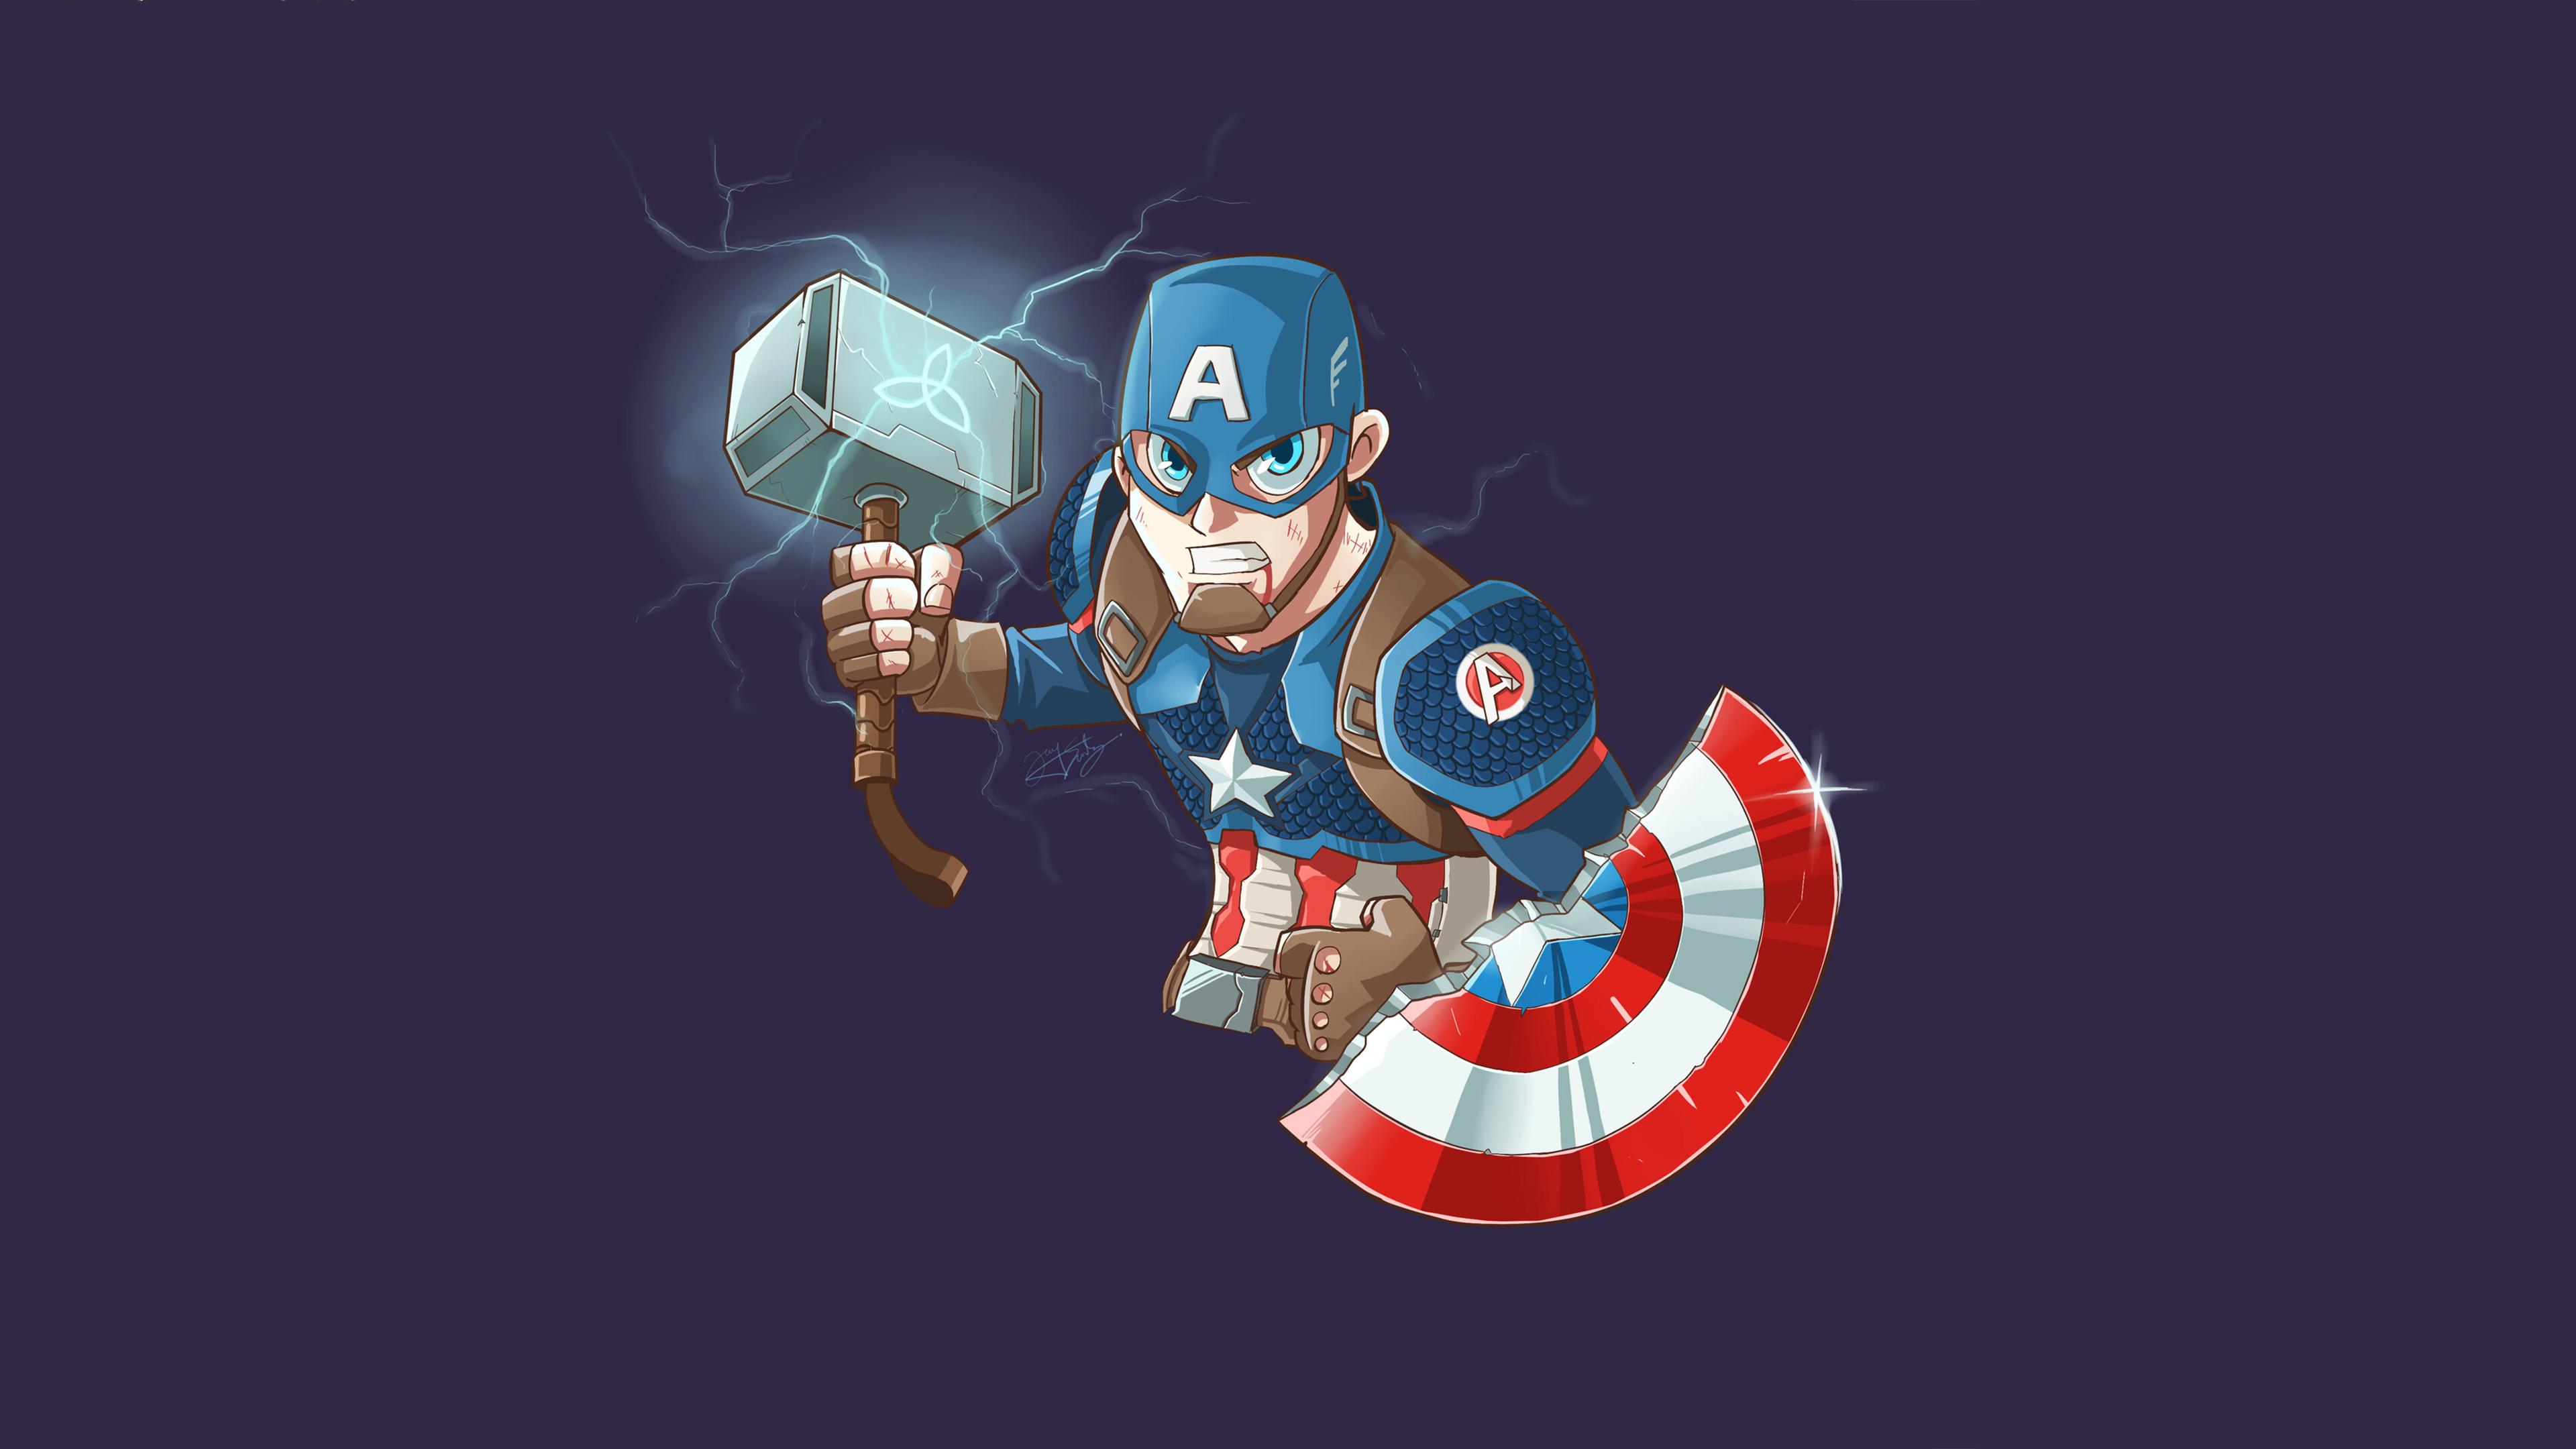 captain america mjolnir art 1565053826 - Captain America Mjolnir Art - superheroes wallpapers, hd-wallpapers, captain america wallpapers, artwork wallpapers, 4k-wallpapers